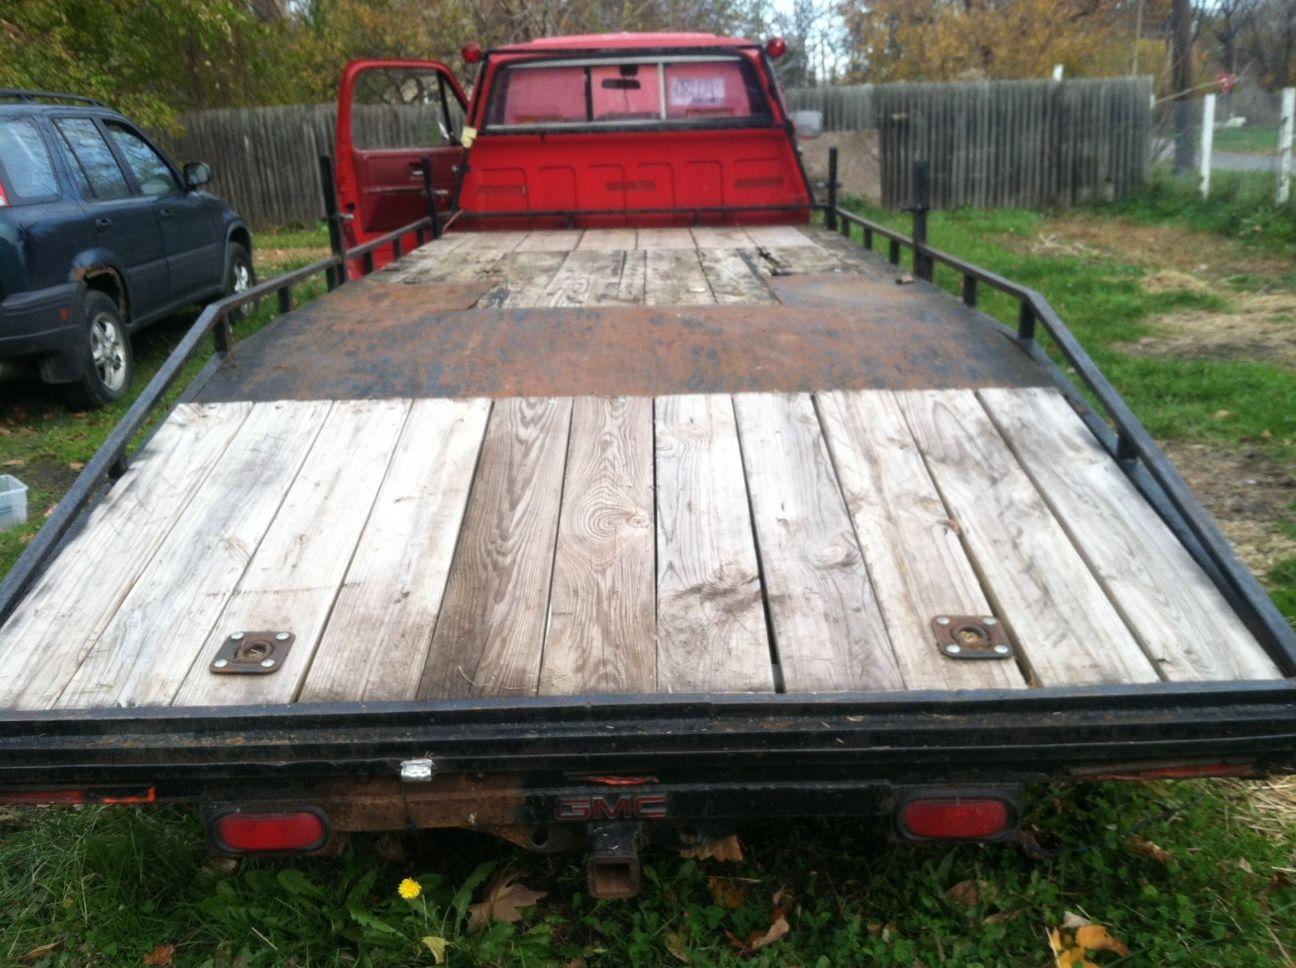 1978 Chevy Vintage Car Hauler - 21 foot Bed - Ramp Truck ...